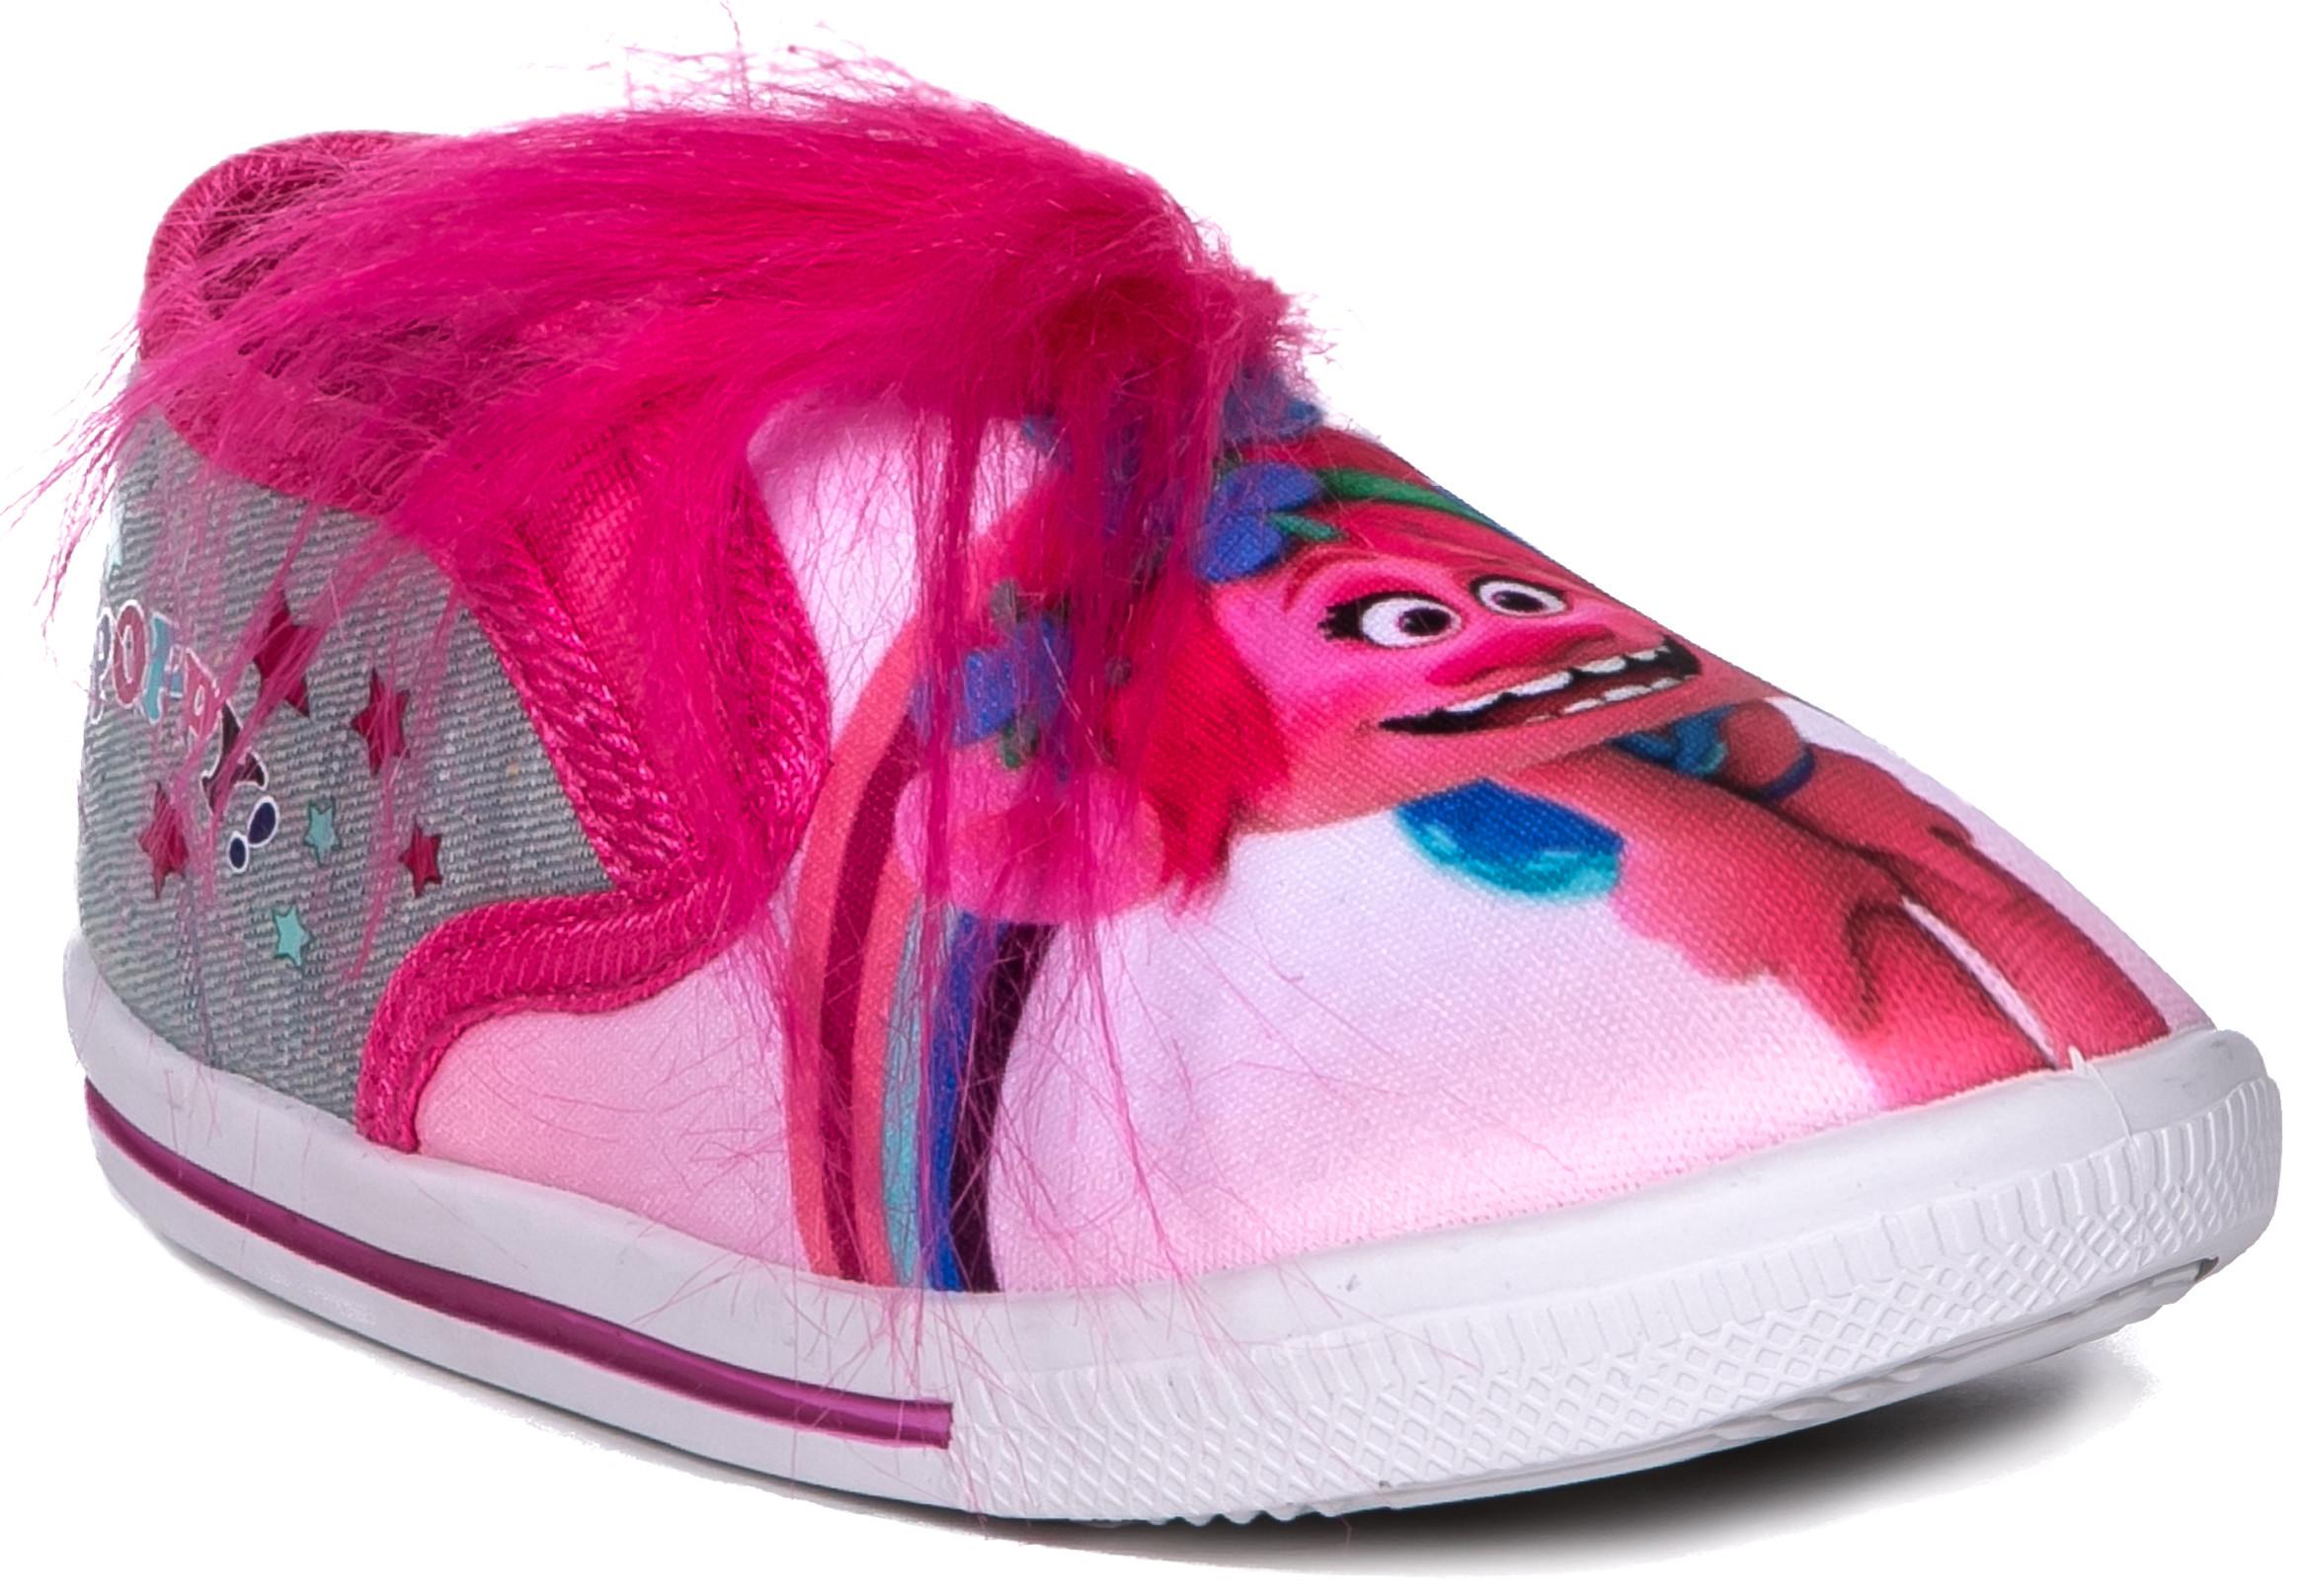 Ботинки и полуботинки Barkito Полуботинки типа кроссовых для девочки TROLLS, фуксия цены онлайн